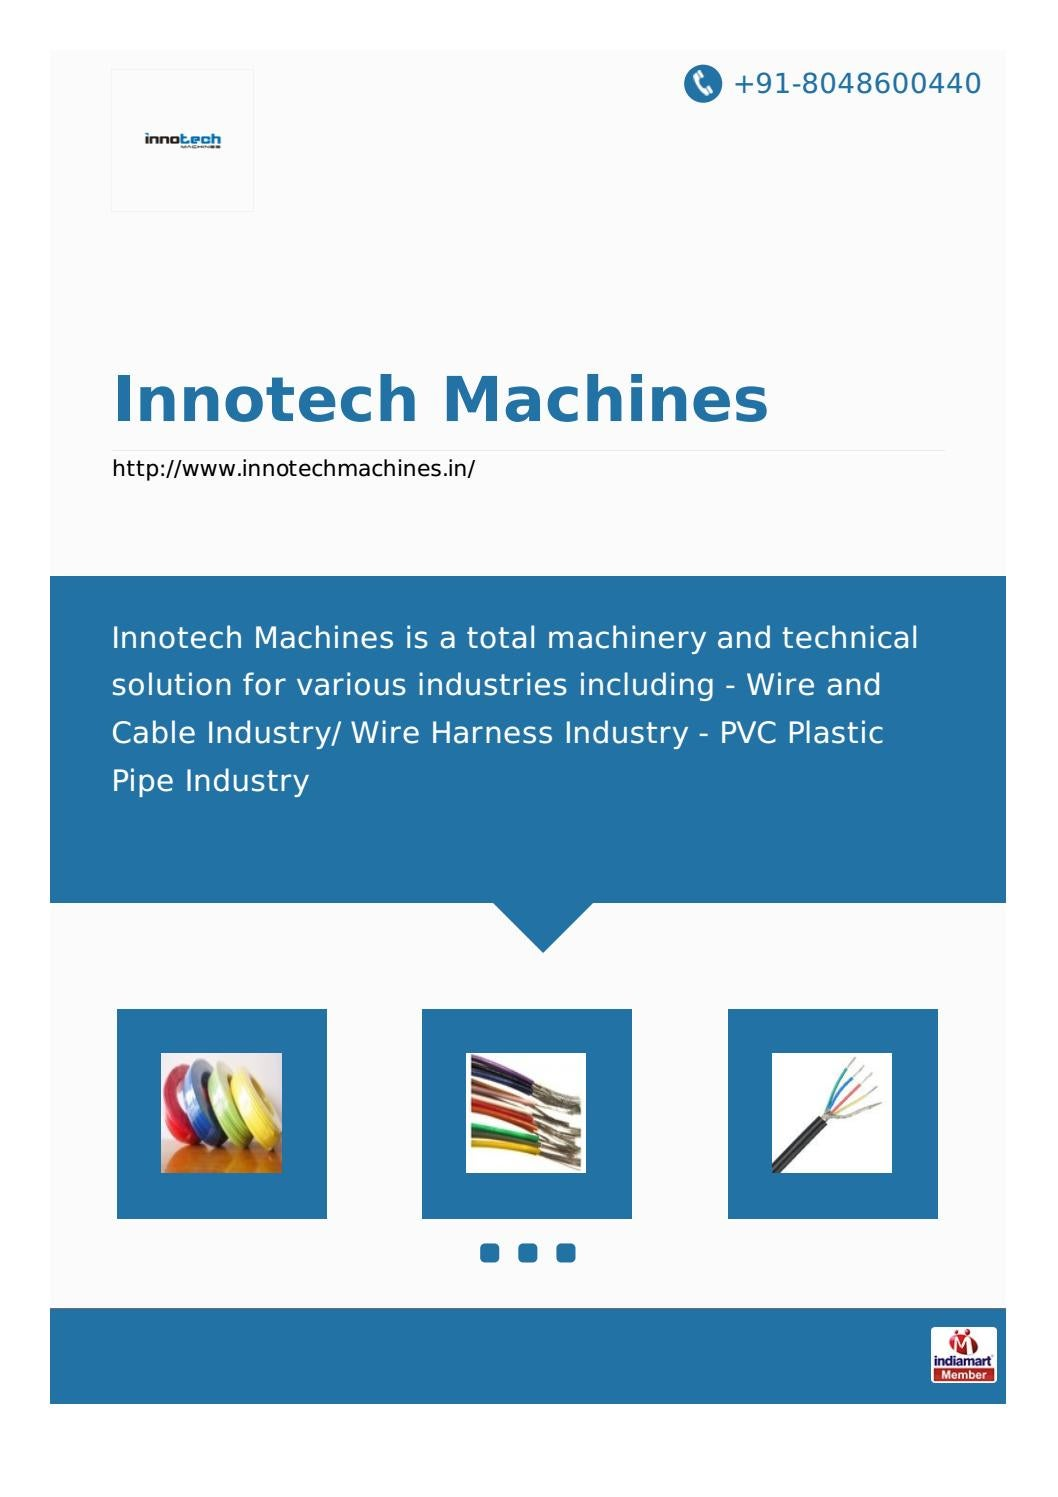 Innotech Machines By Issuu Wiring Harness India